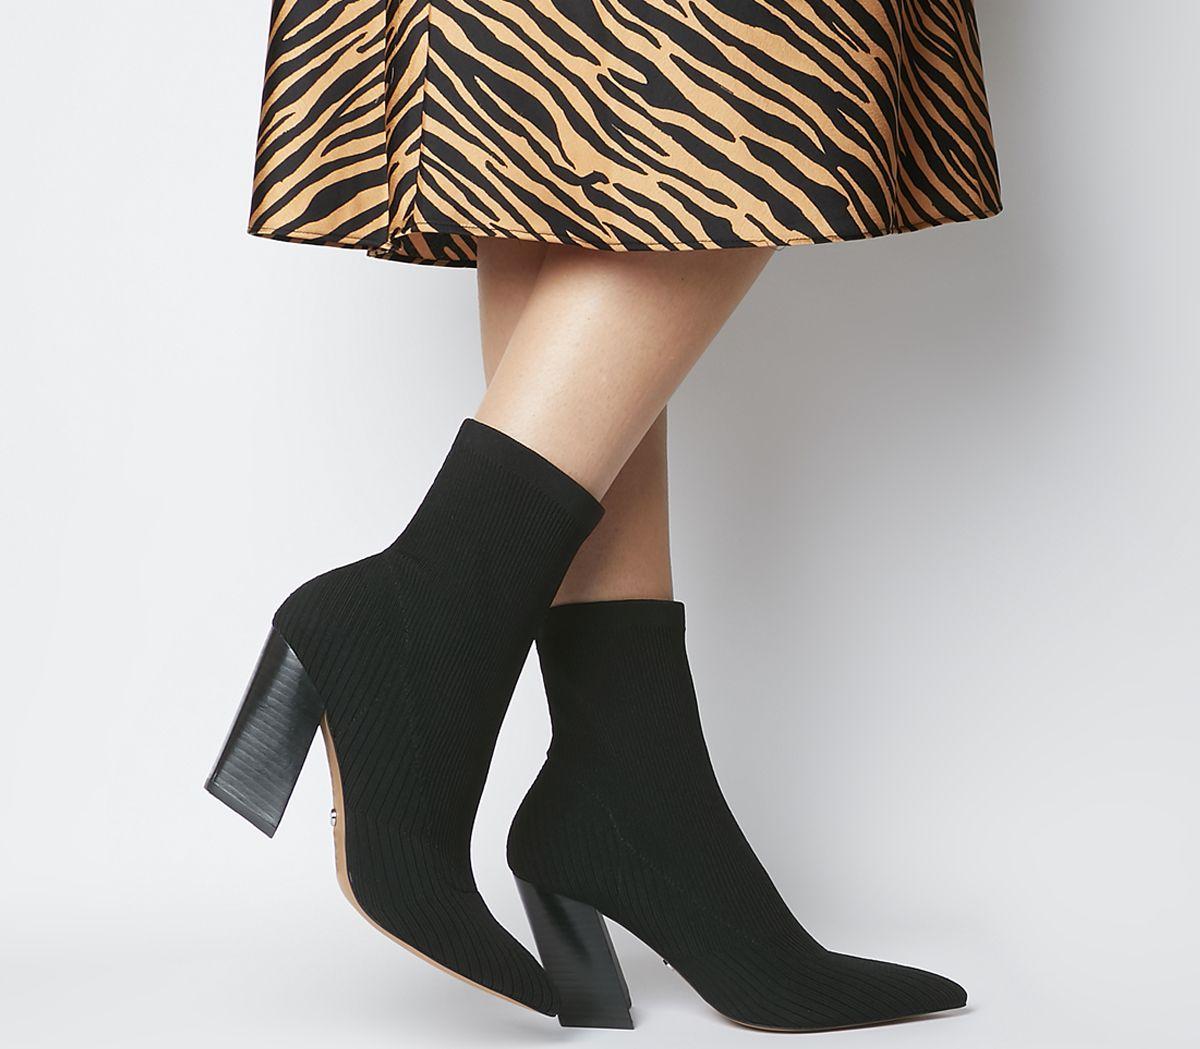 Aniseed Angled Heel Sock Boots Black Knit